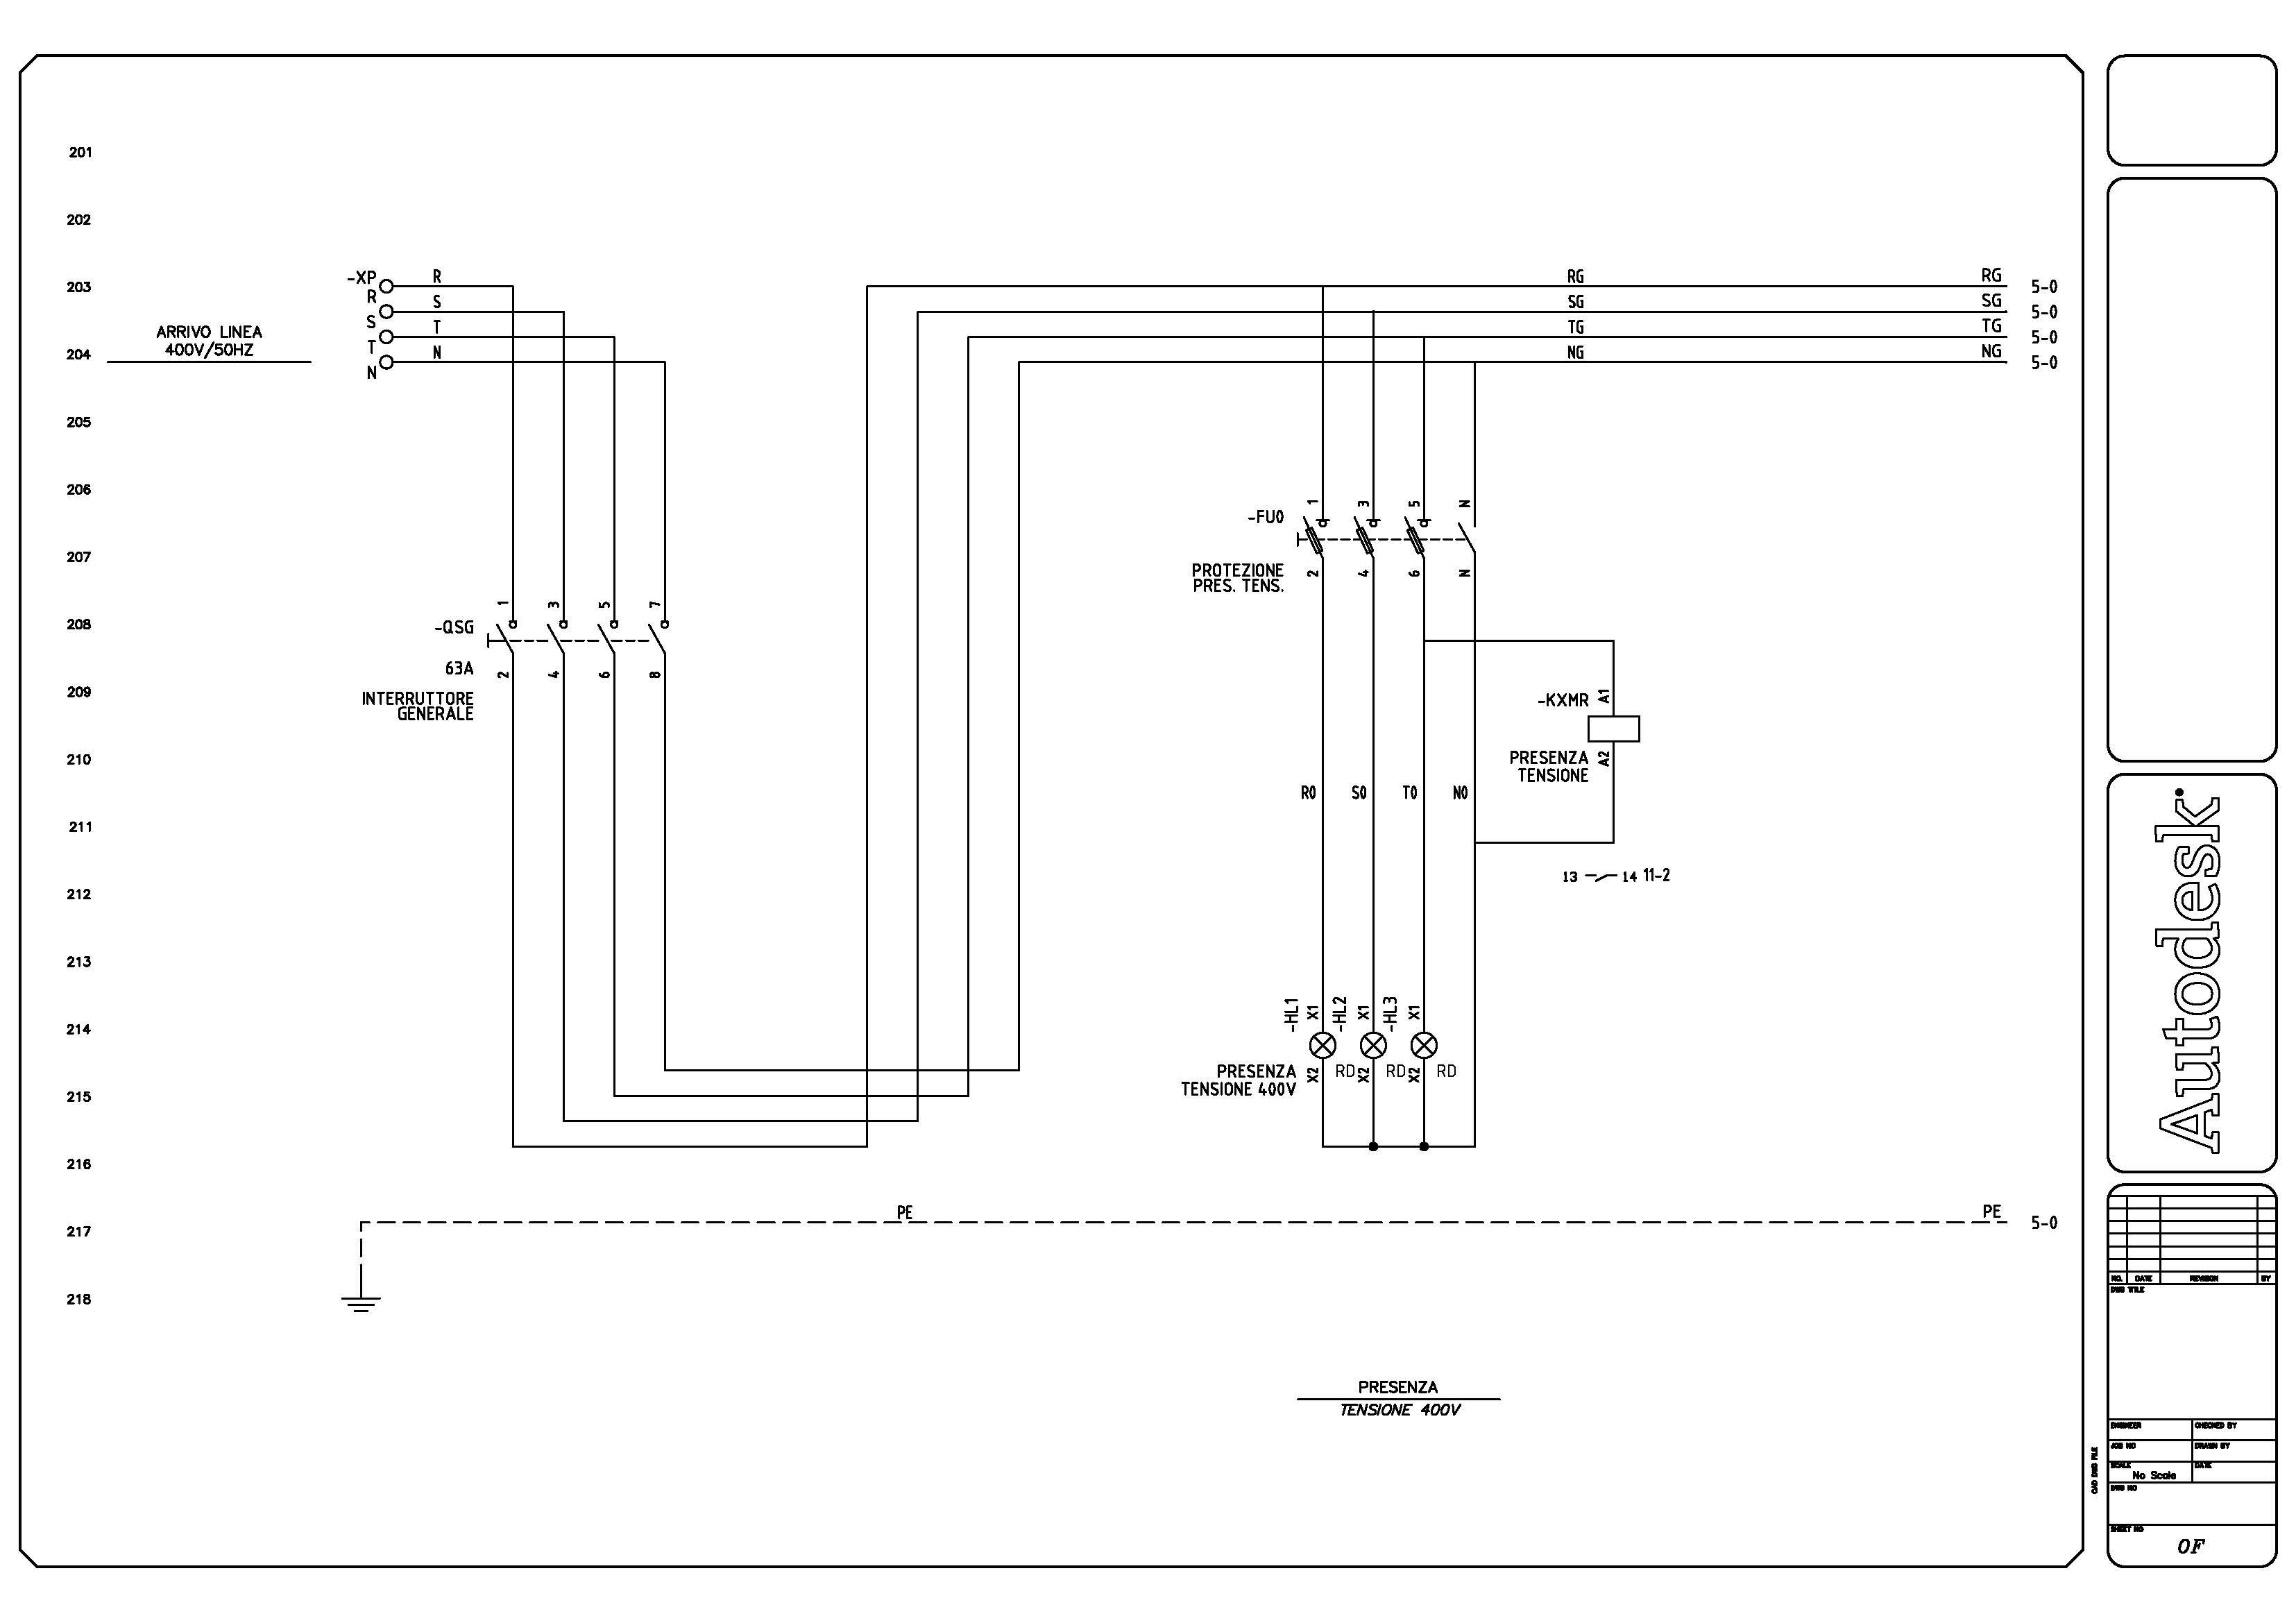 Schemi Elettrici Quadri : Edrawing u consulenza sviluppo e stesura di schemi elettrici